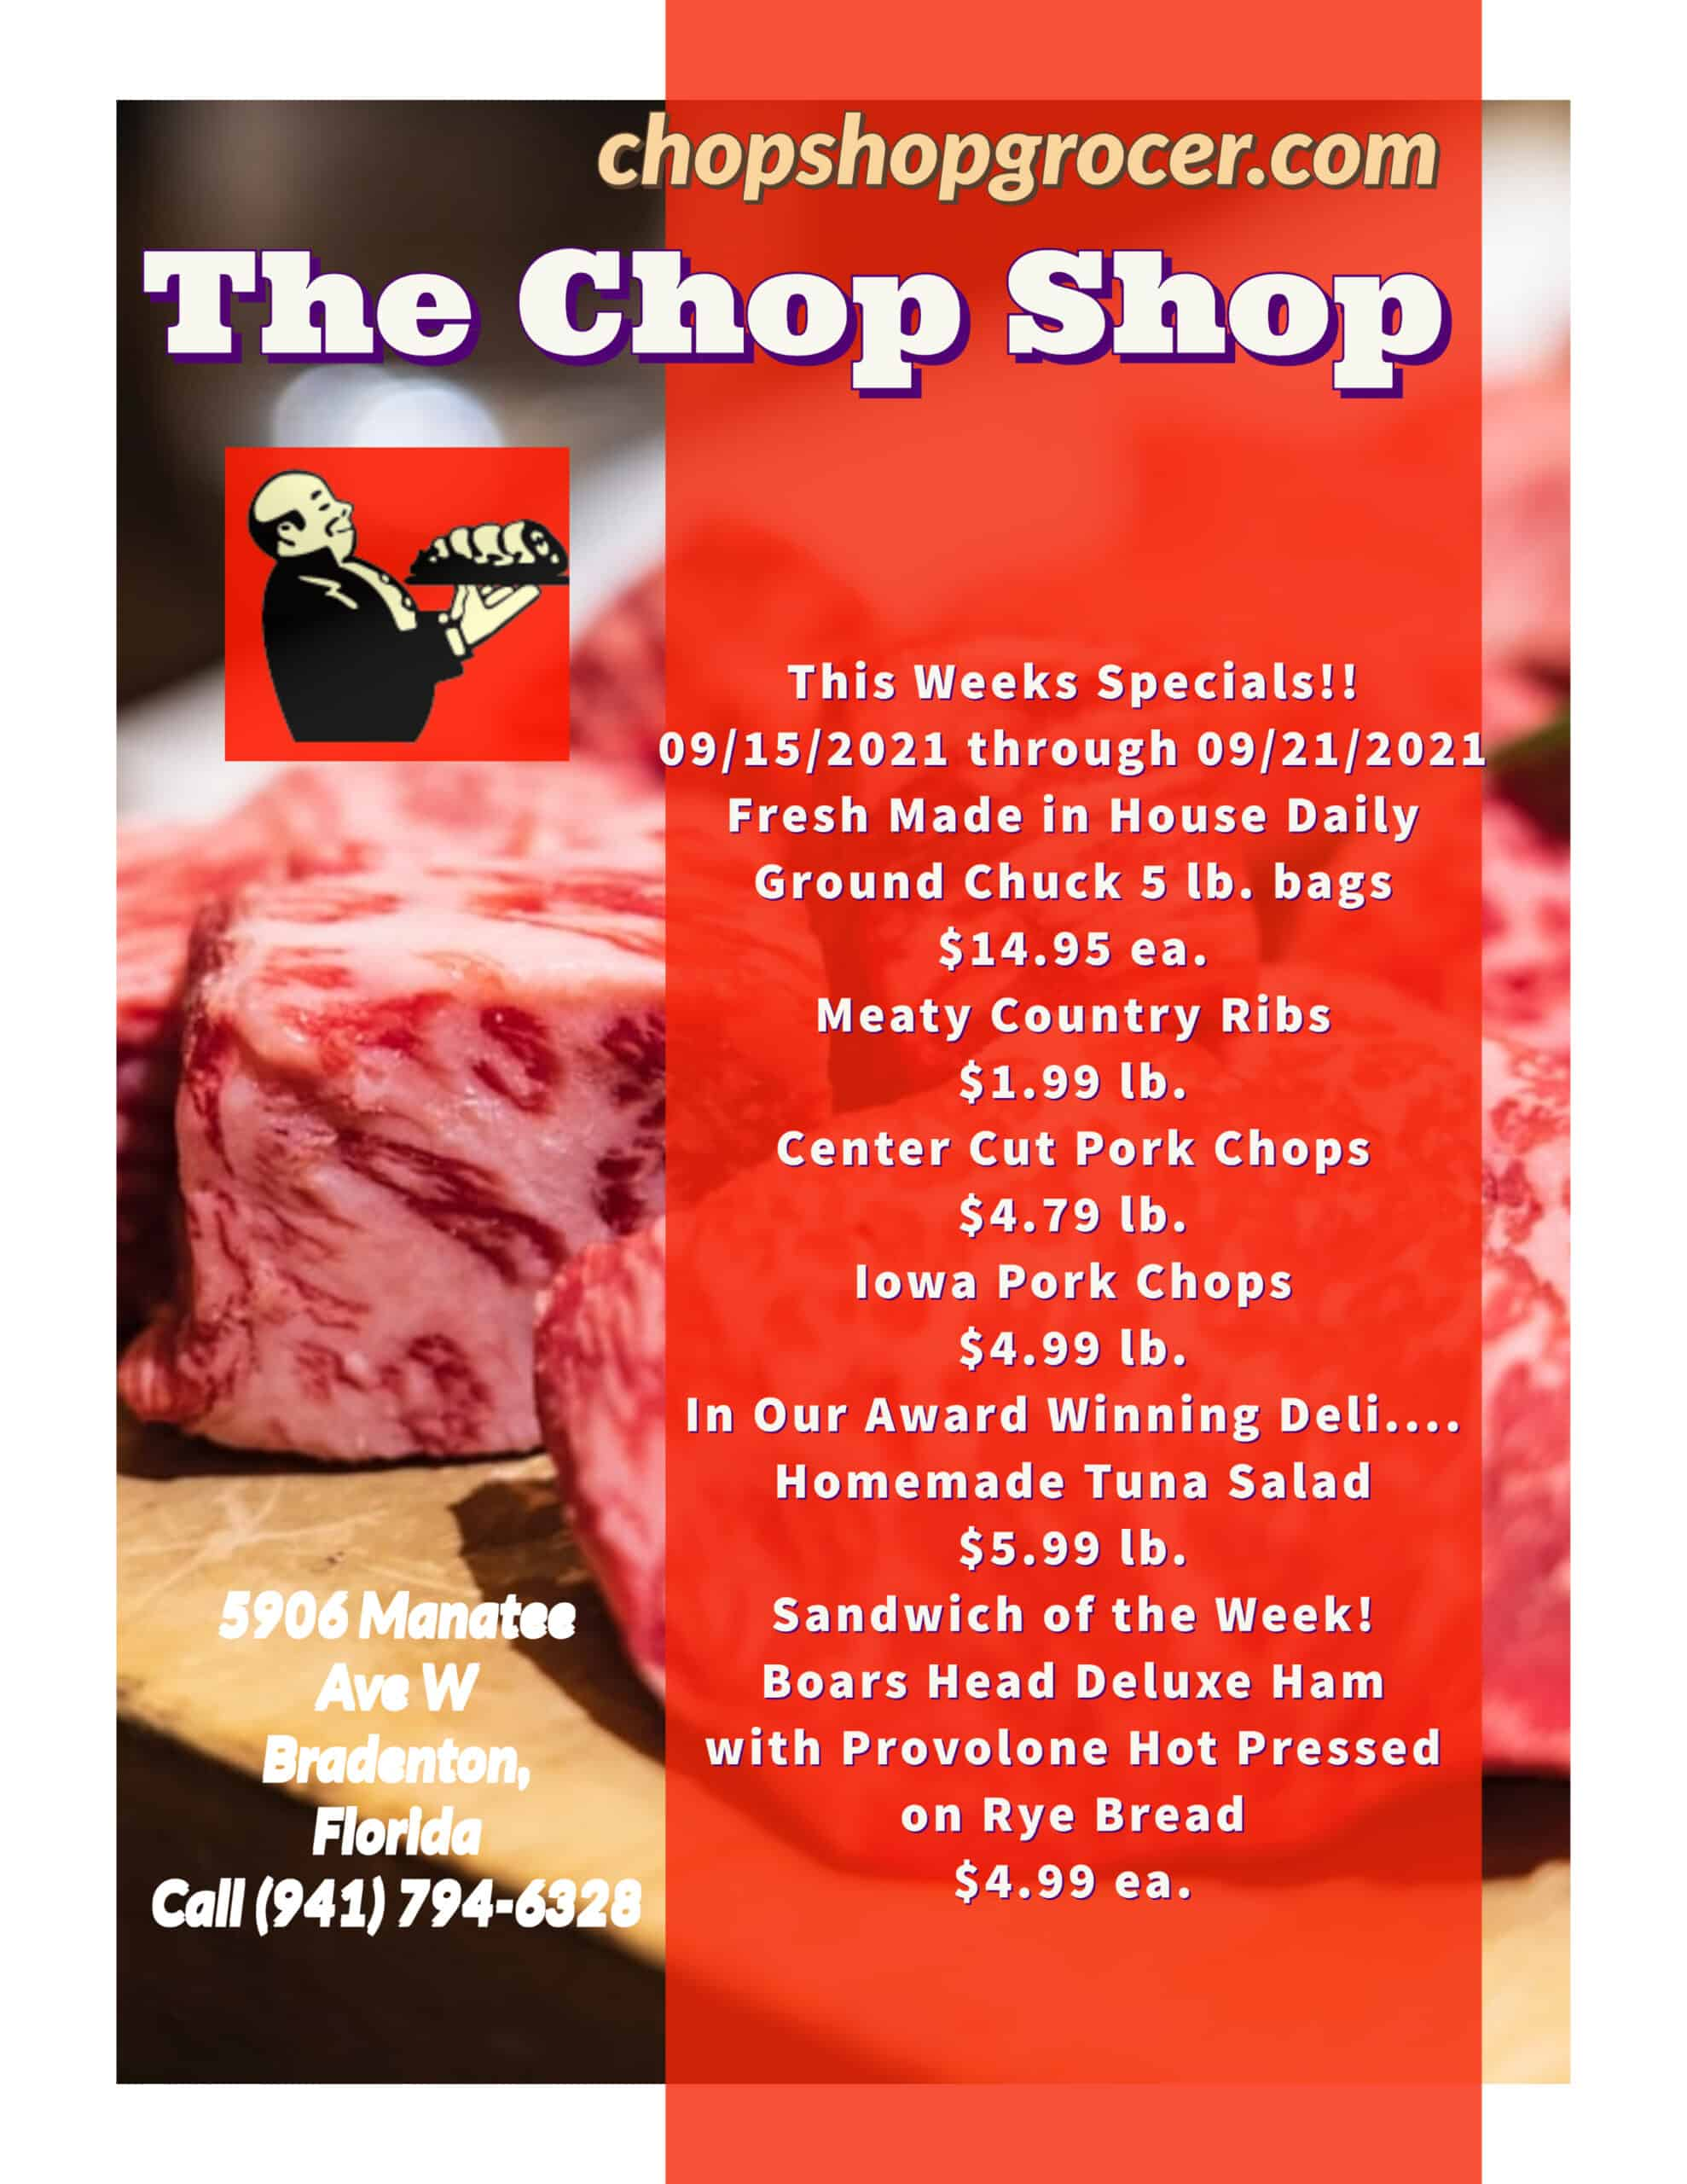 2 chop shop